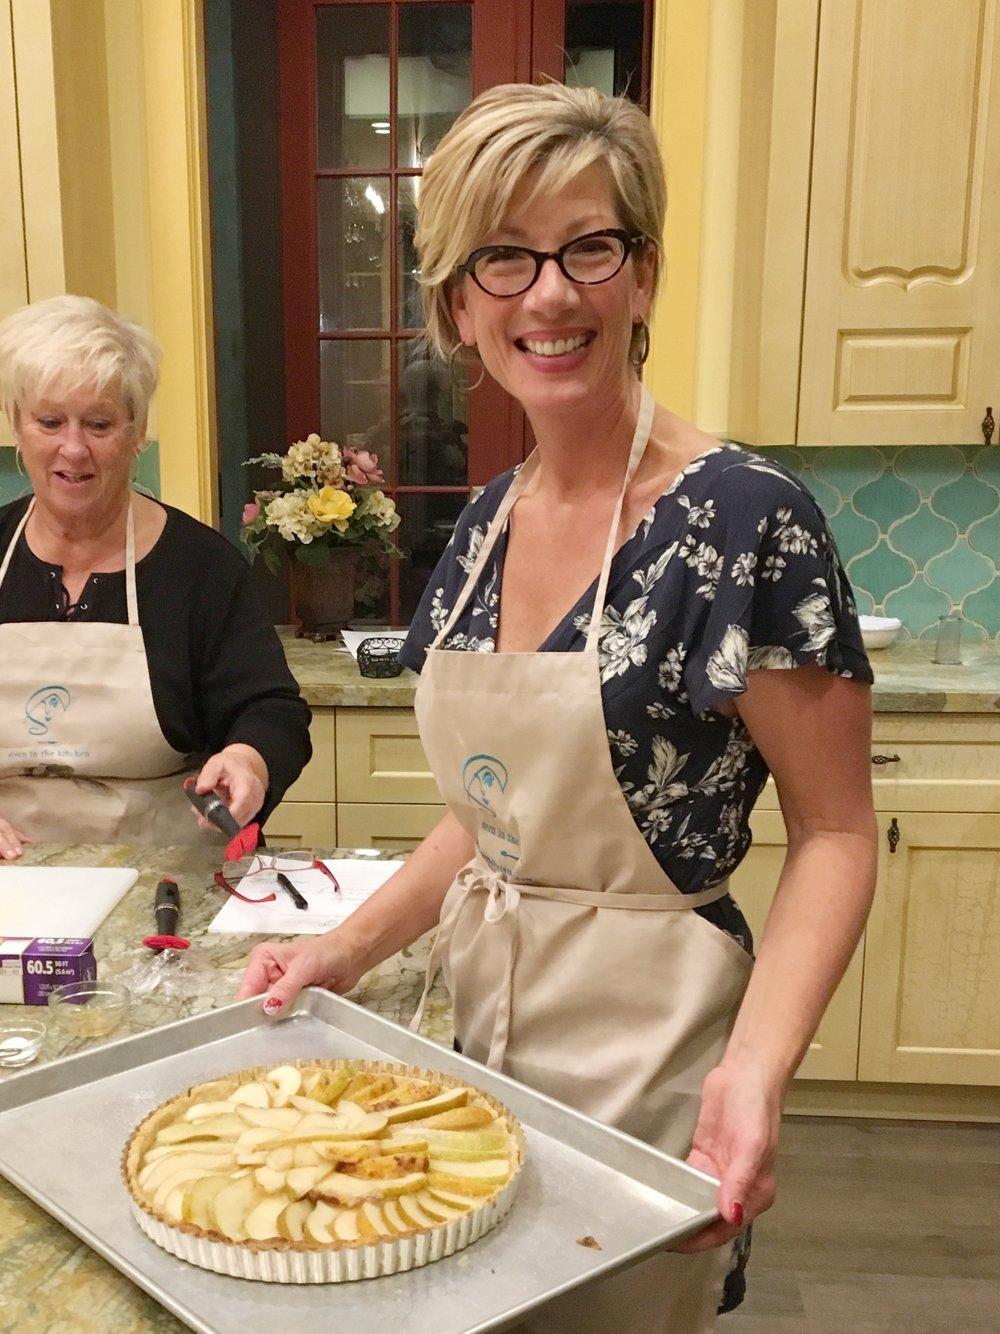 Holly Brown, AKA Siren in the Kitchen!